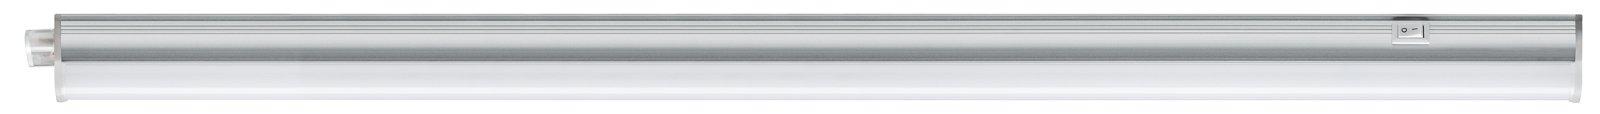 LED-onderkastverlichting Bond 1.146x25mm 1200lm 230V 4000K Satijn